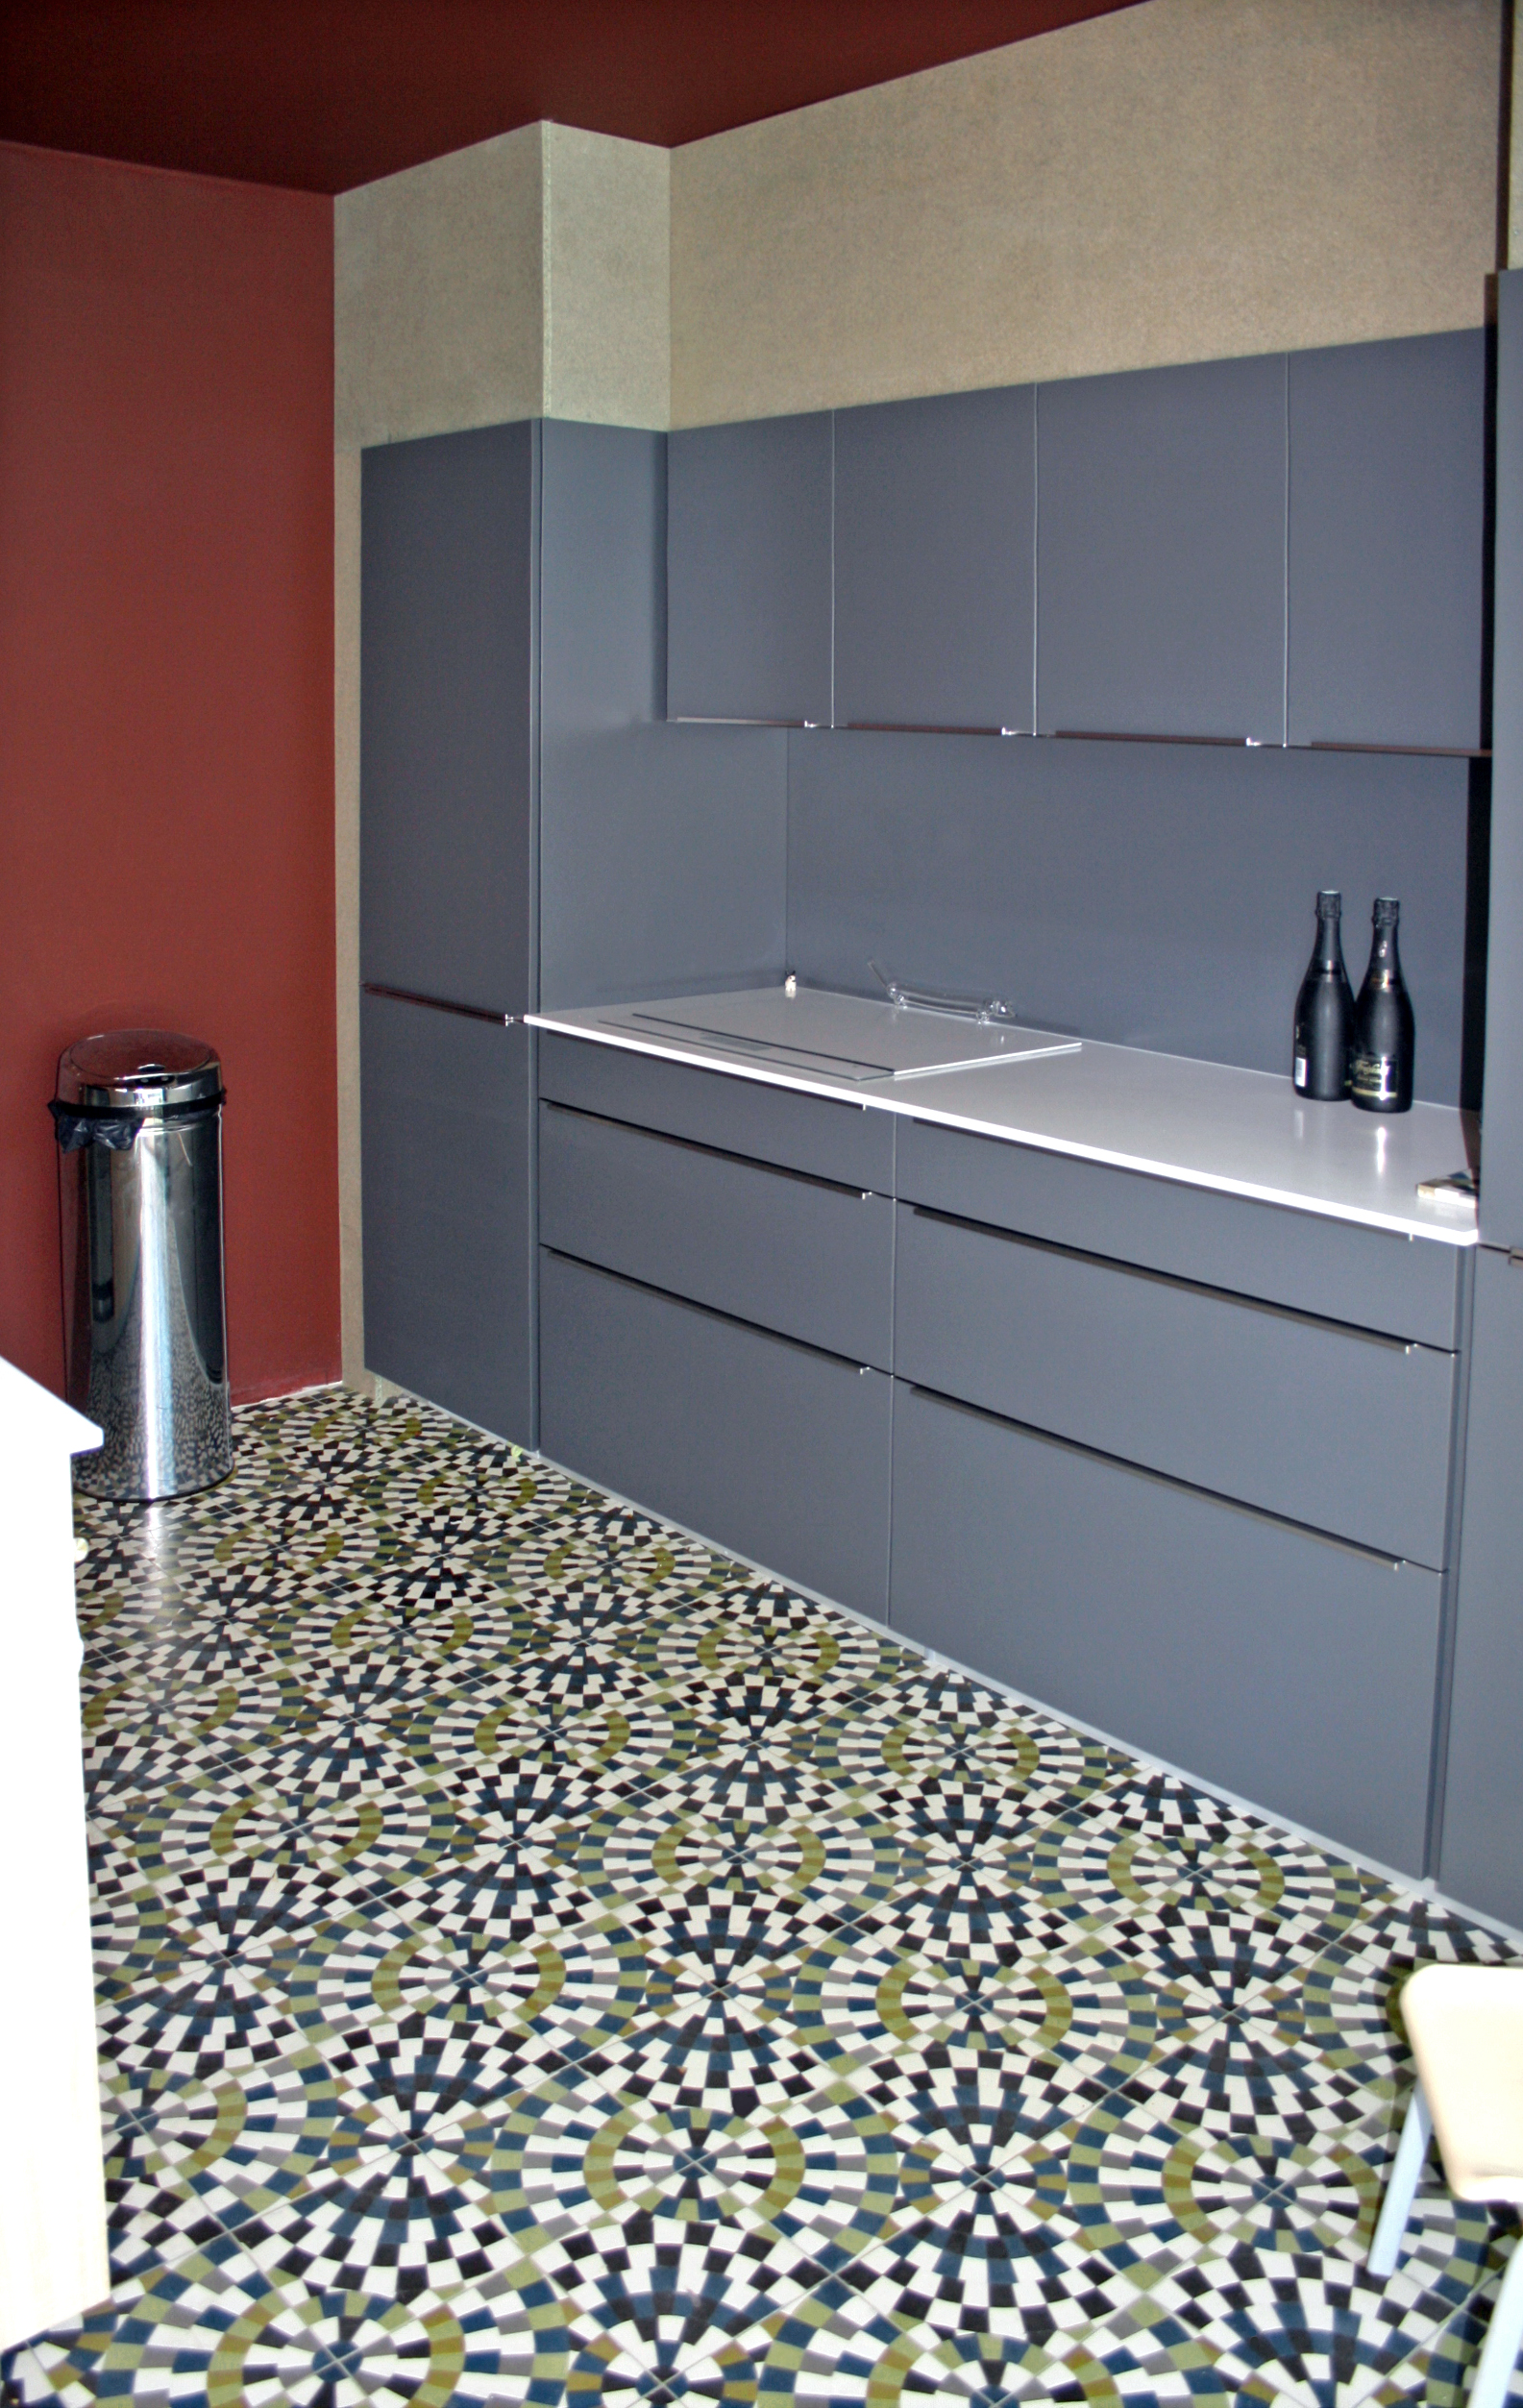 zementfliesen aus spanien. Black Bedroom Furniture Sets. Home Design Ideas